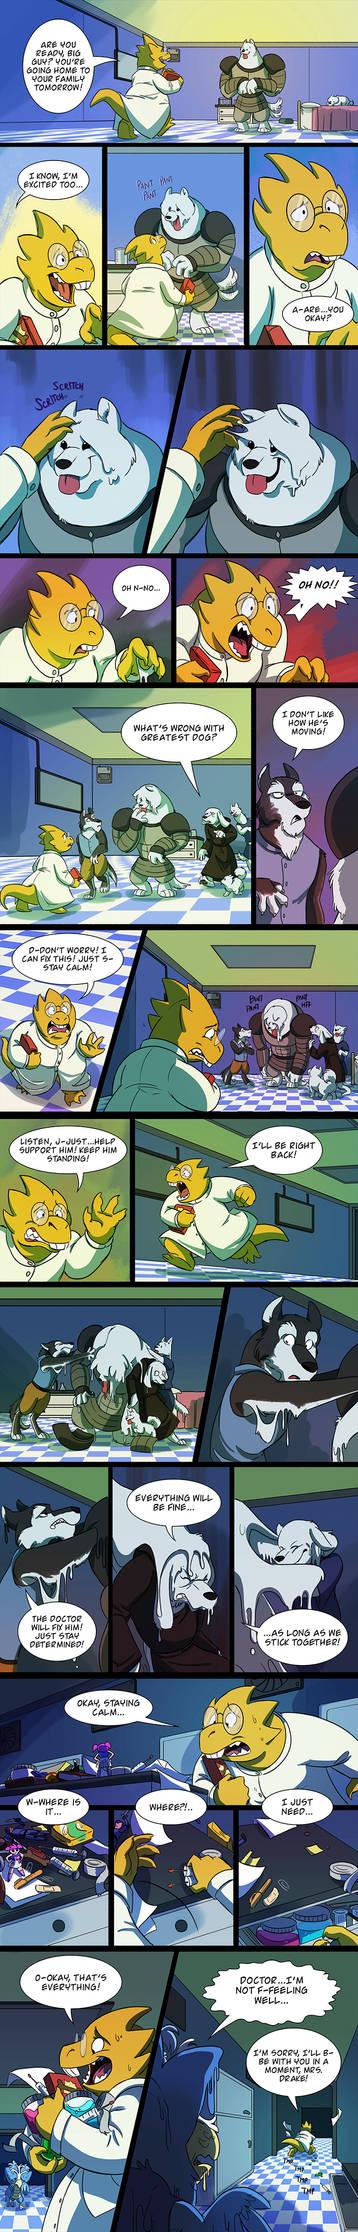 UT - True Lab Origins - page 1